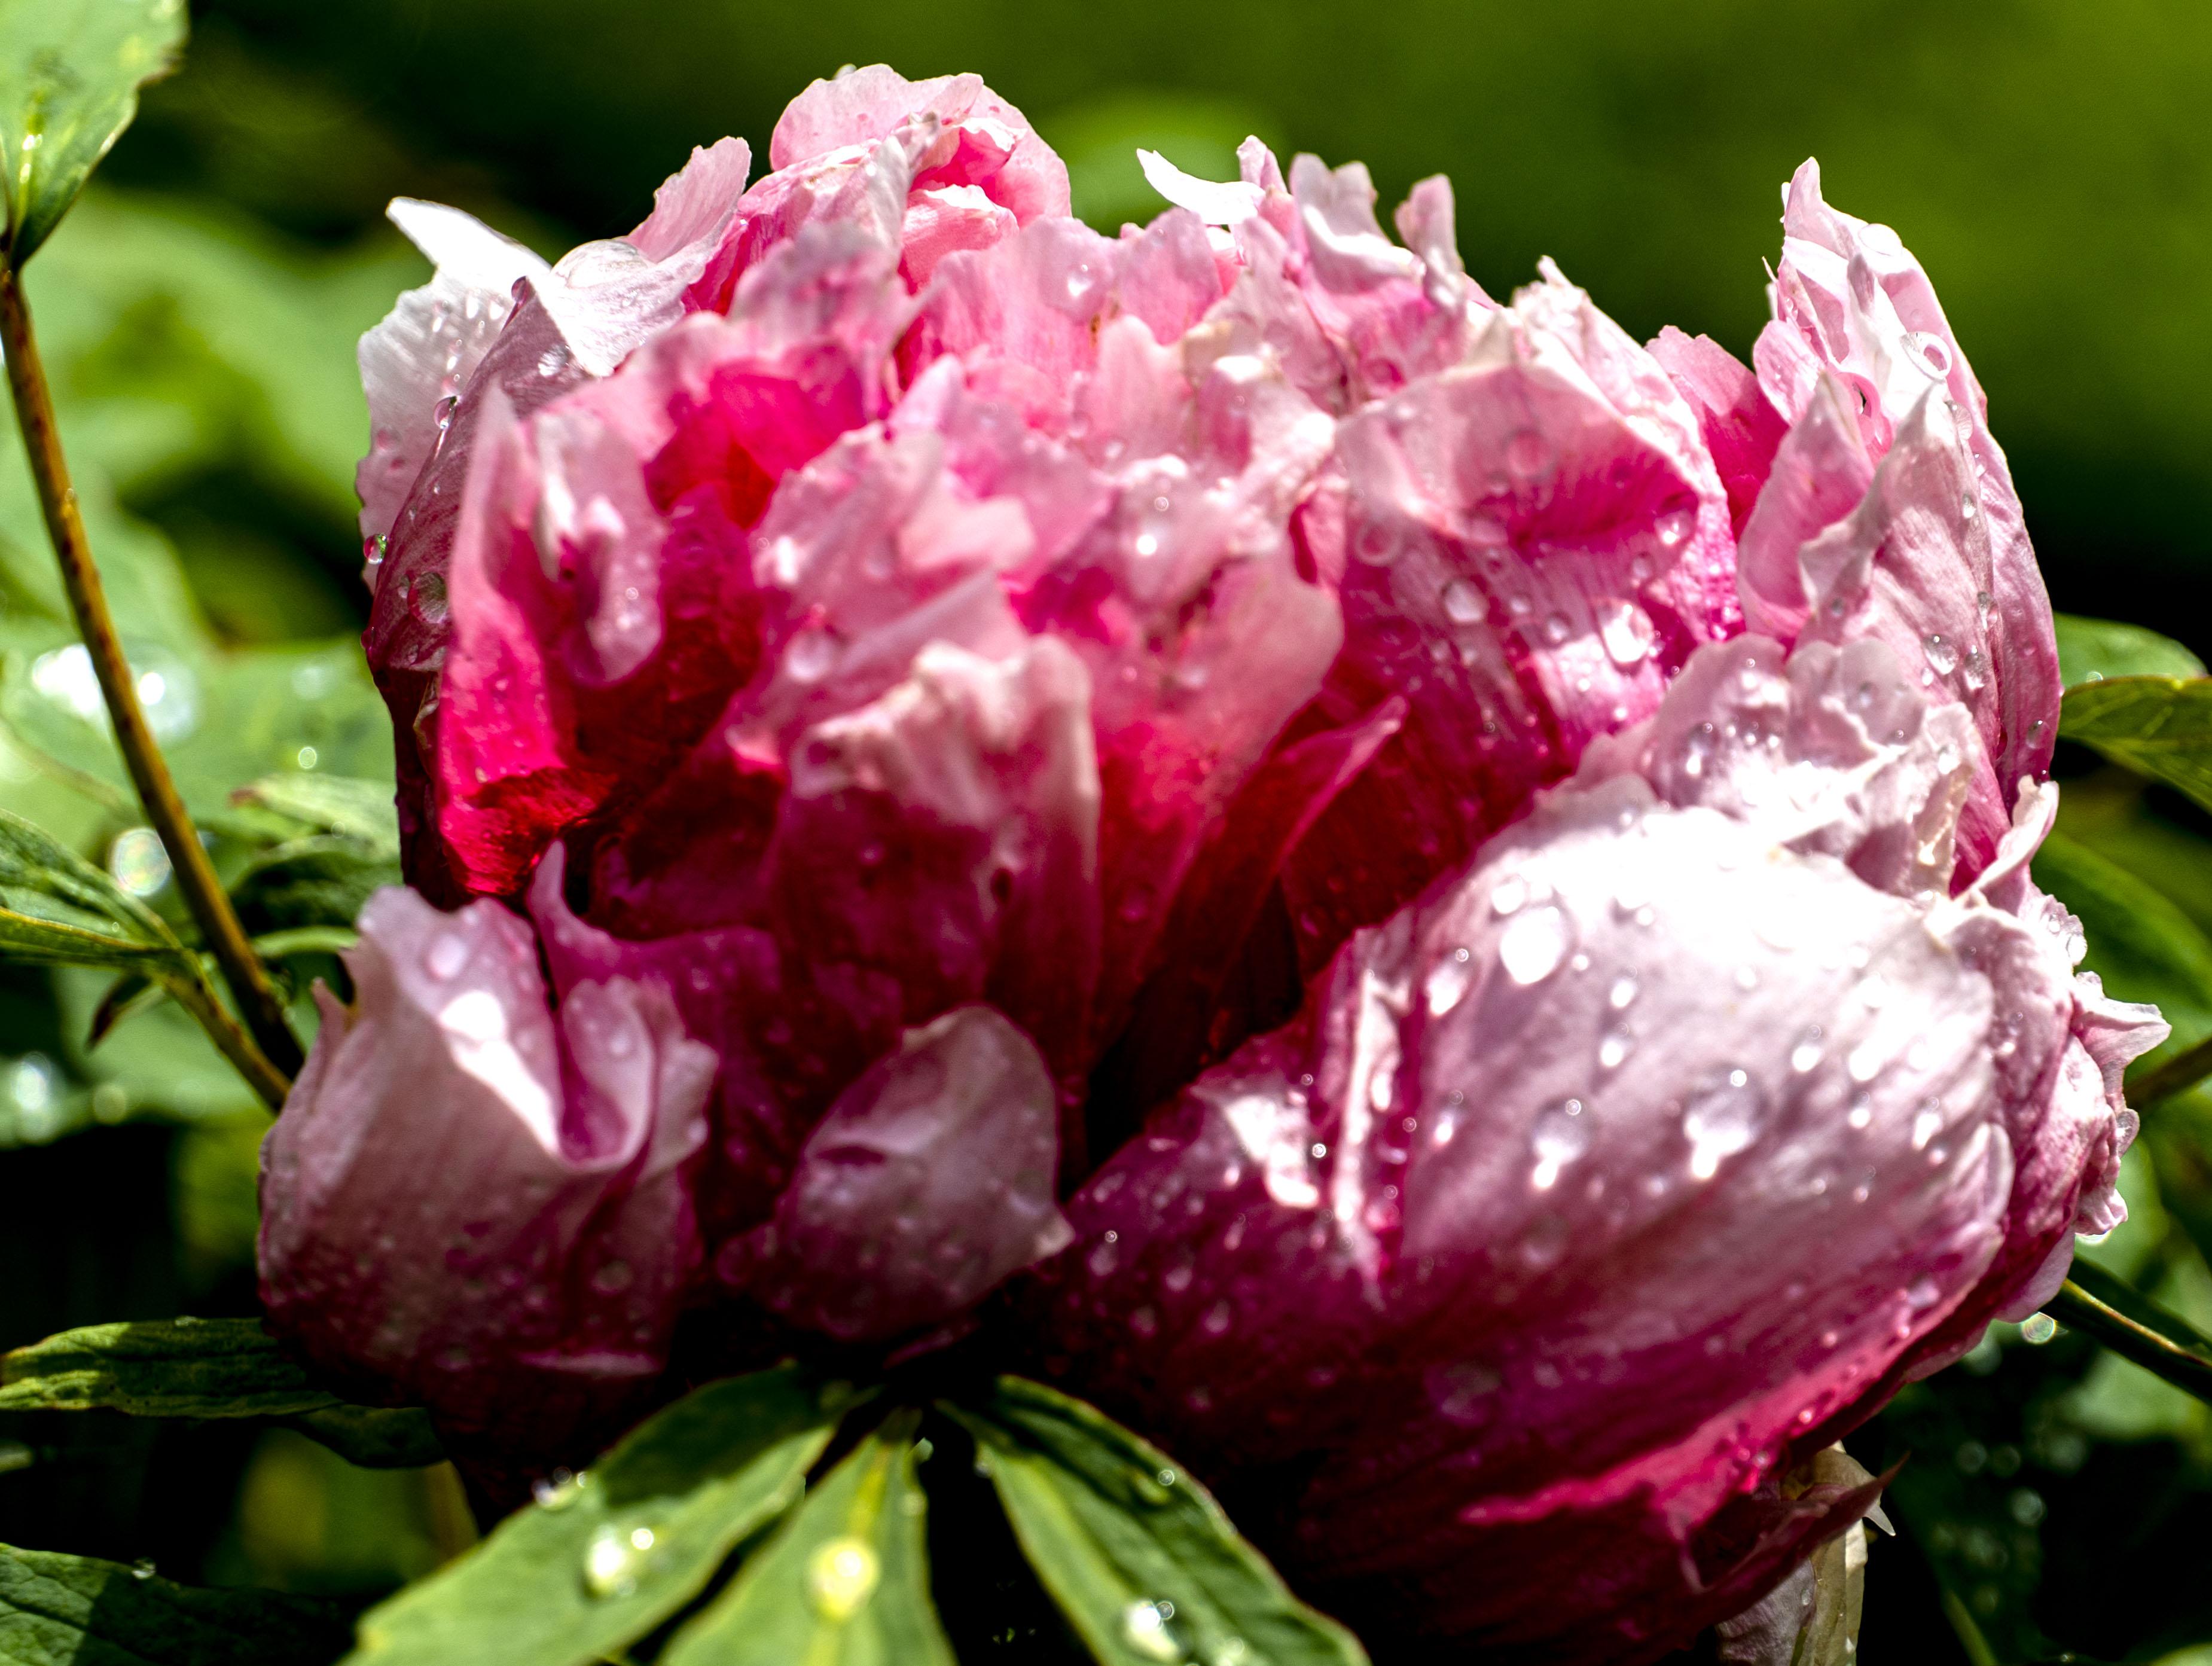 Wet pinkish Peony copy